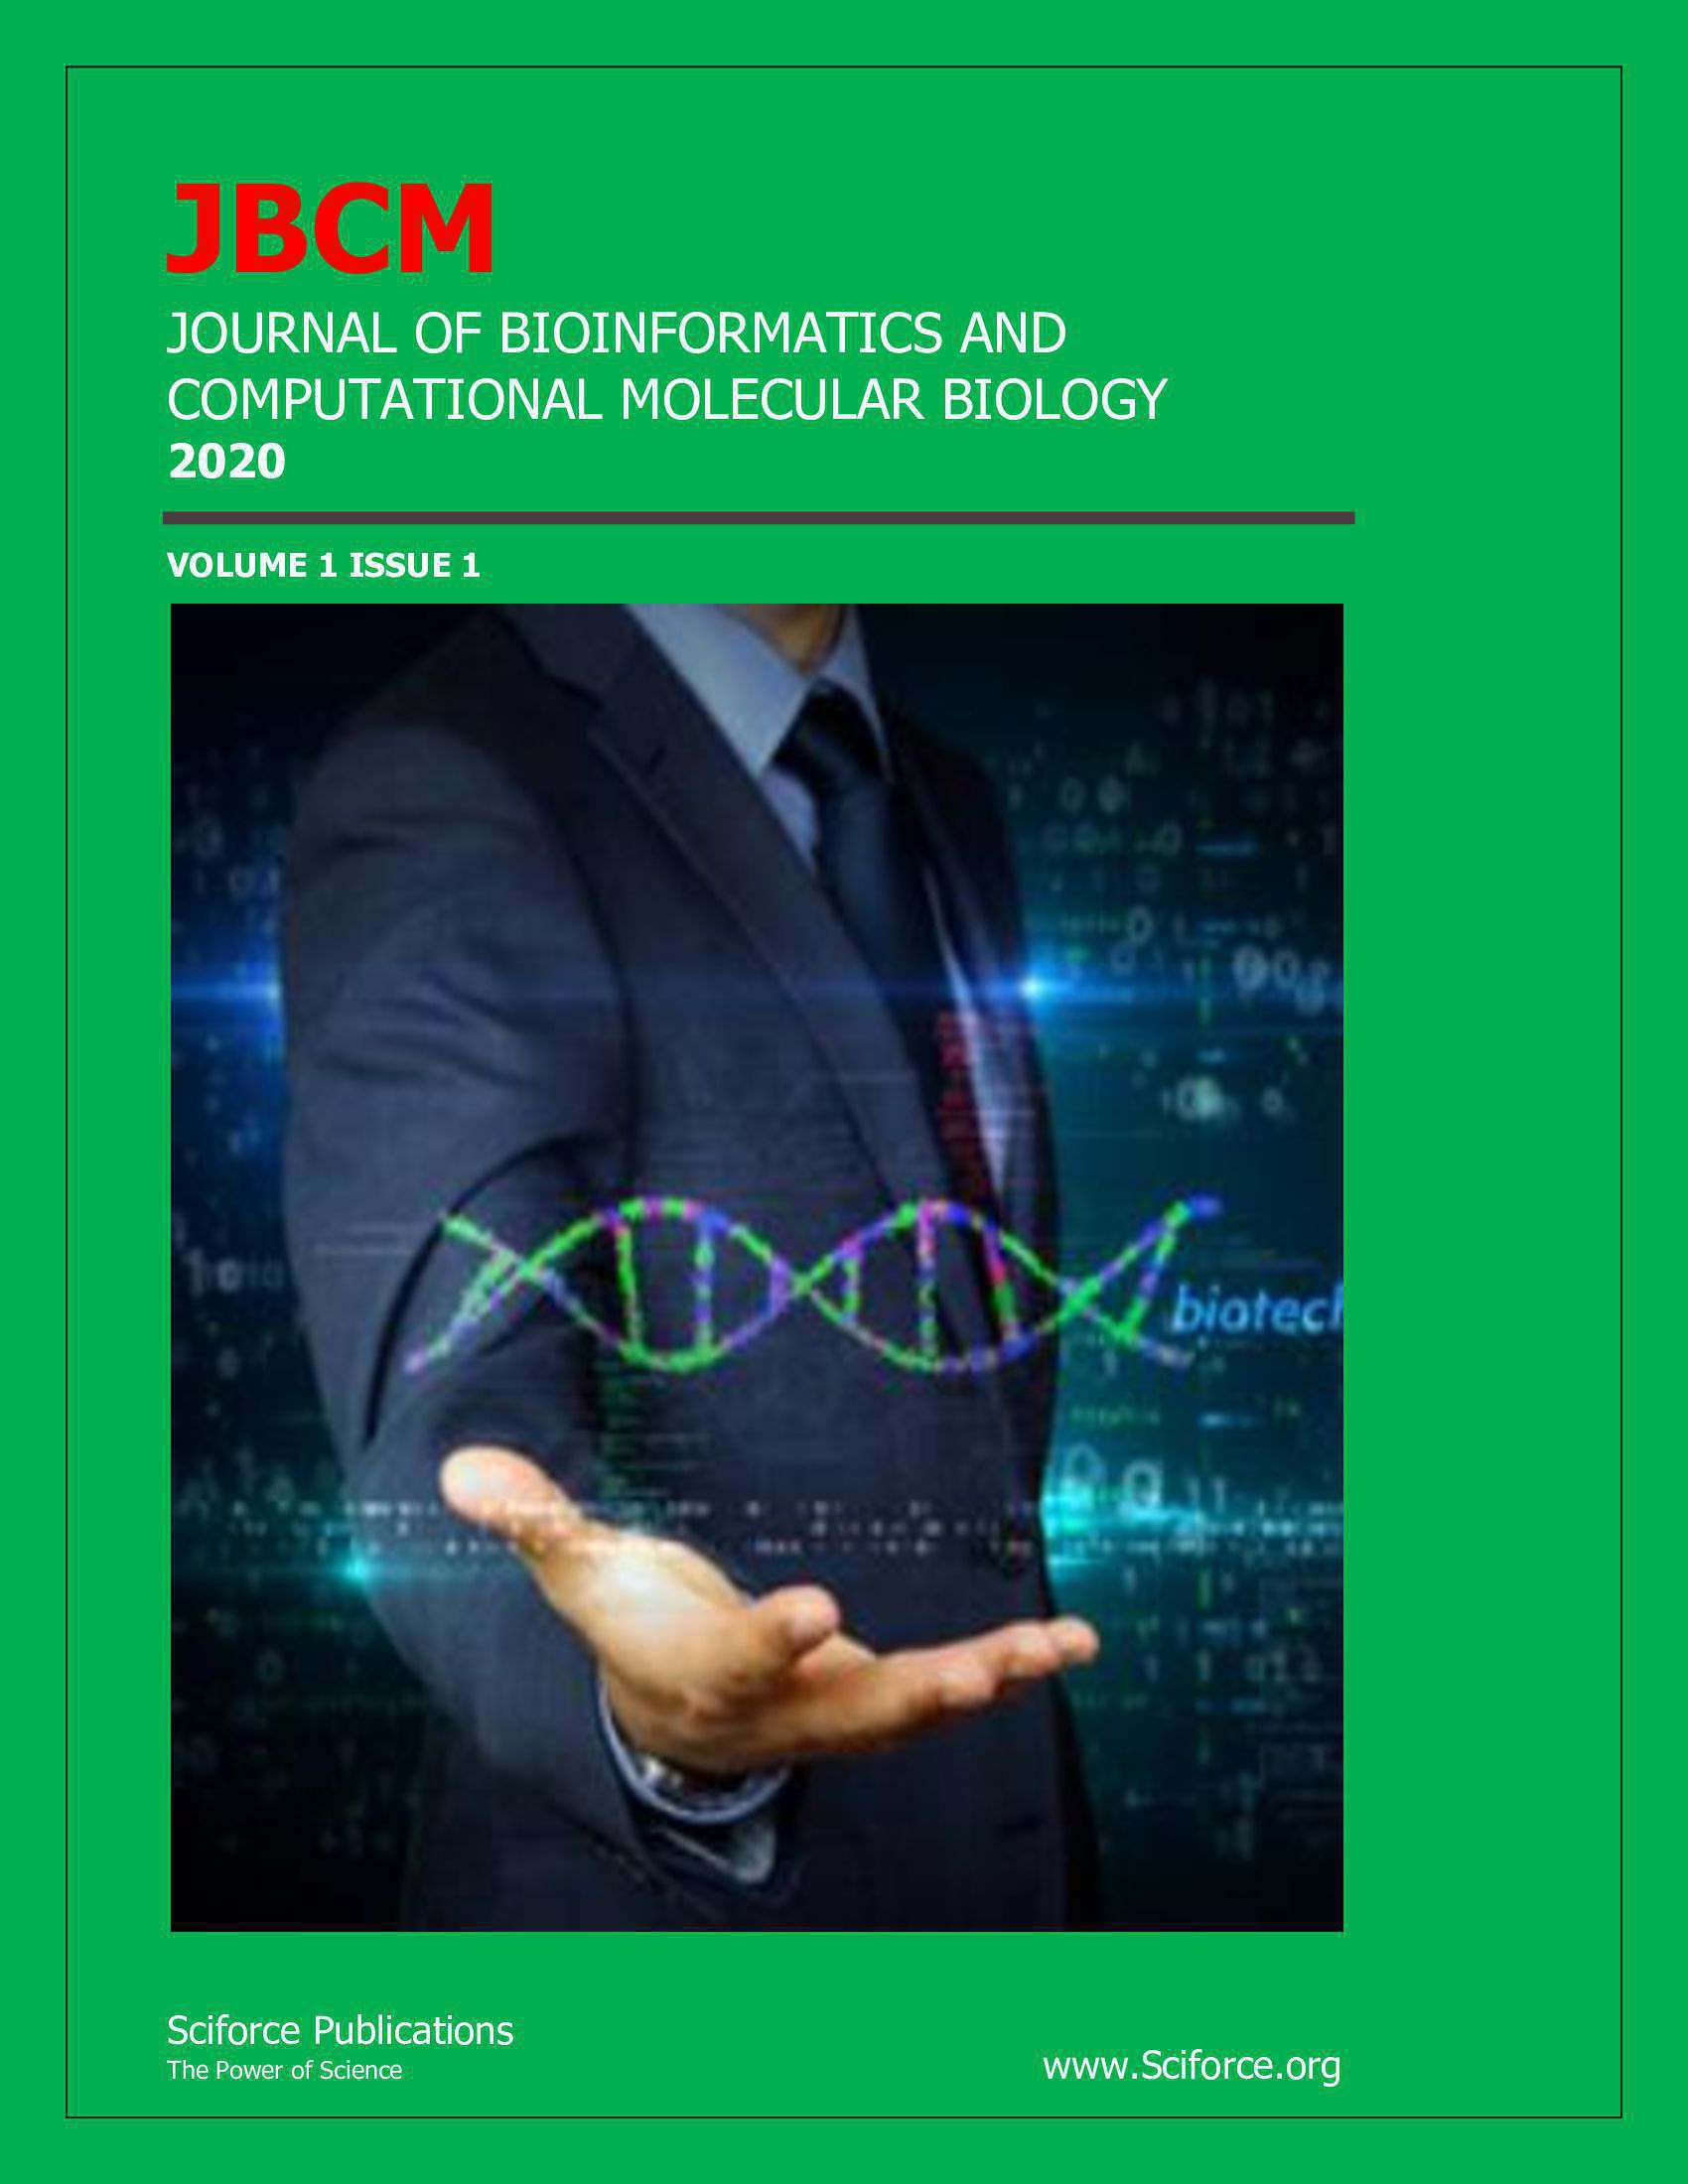 Journal of Bioinformatics and Computational Molecularbiology